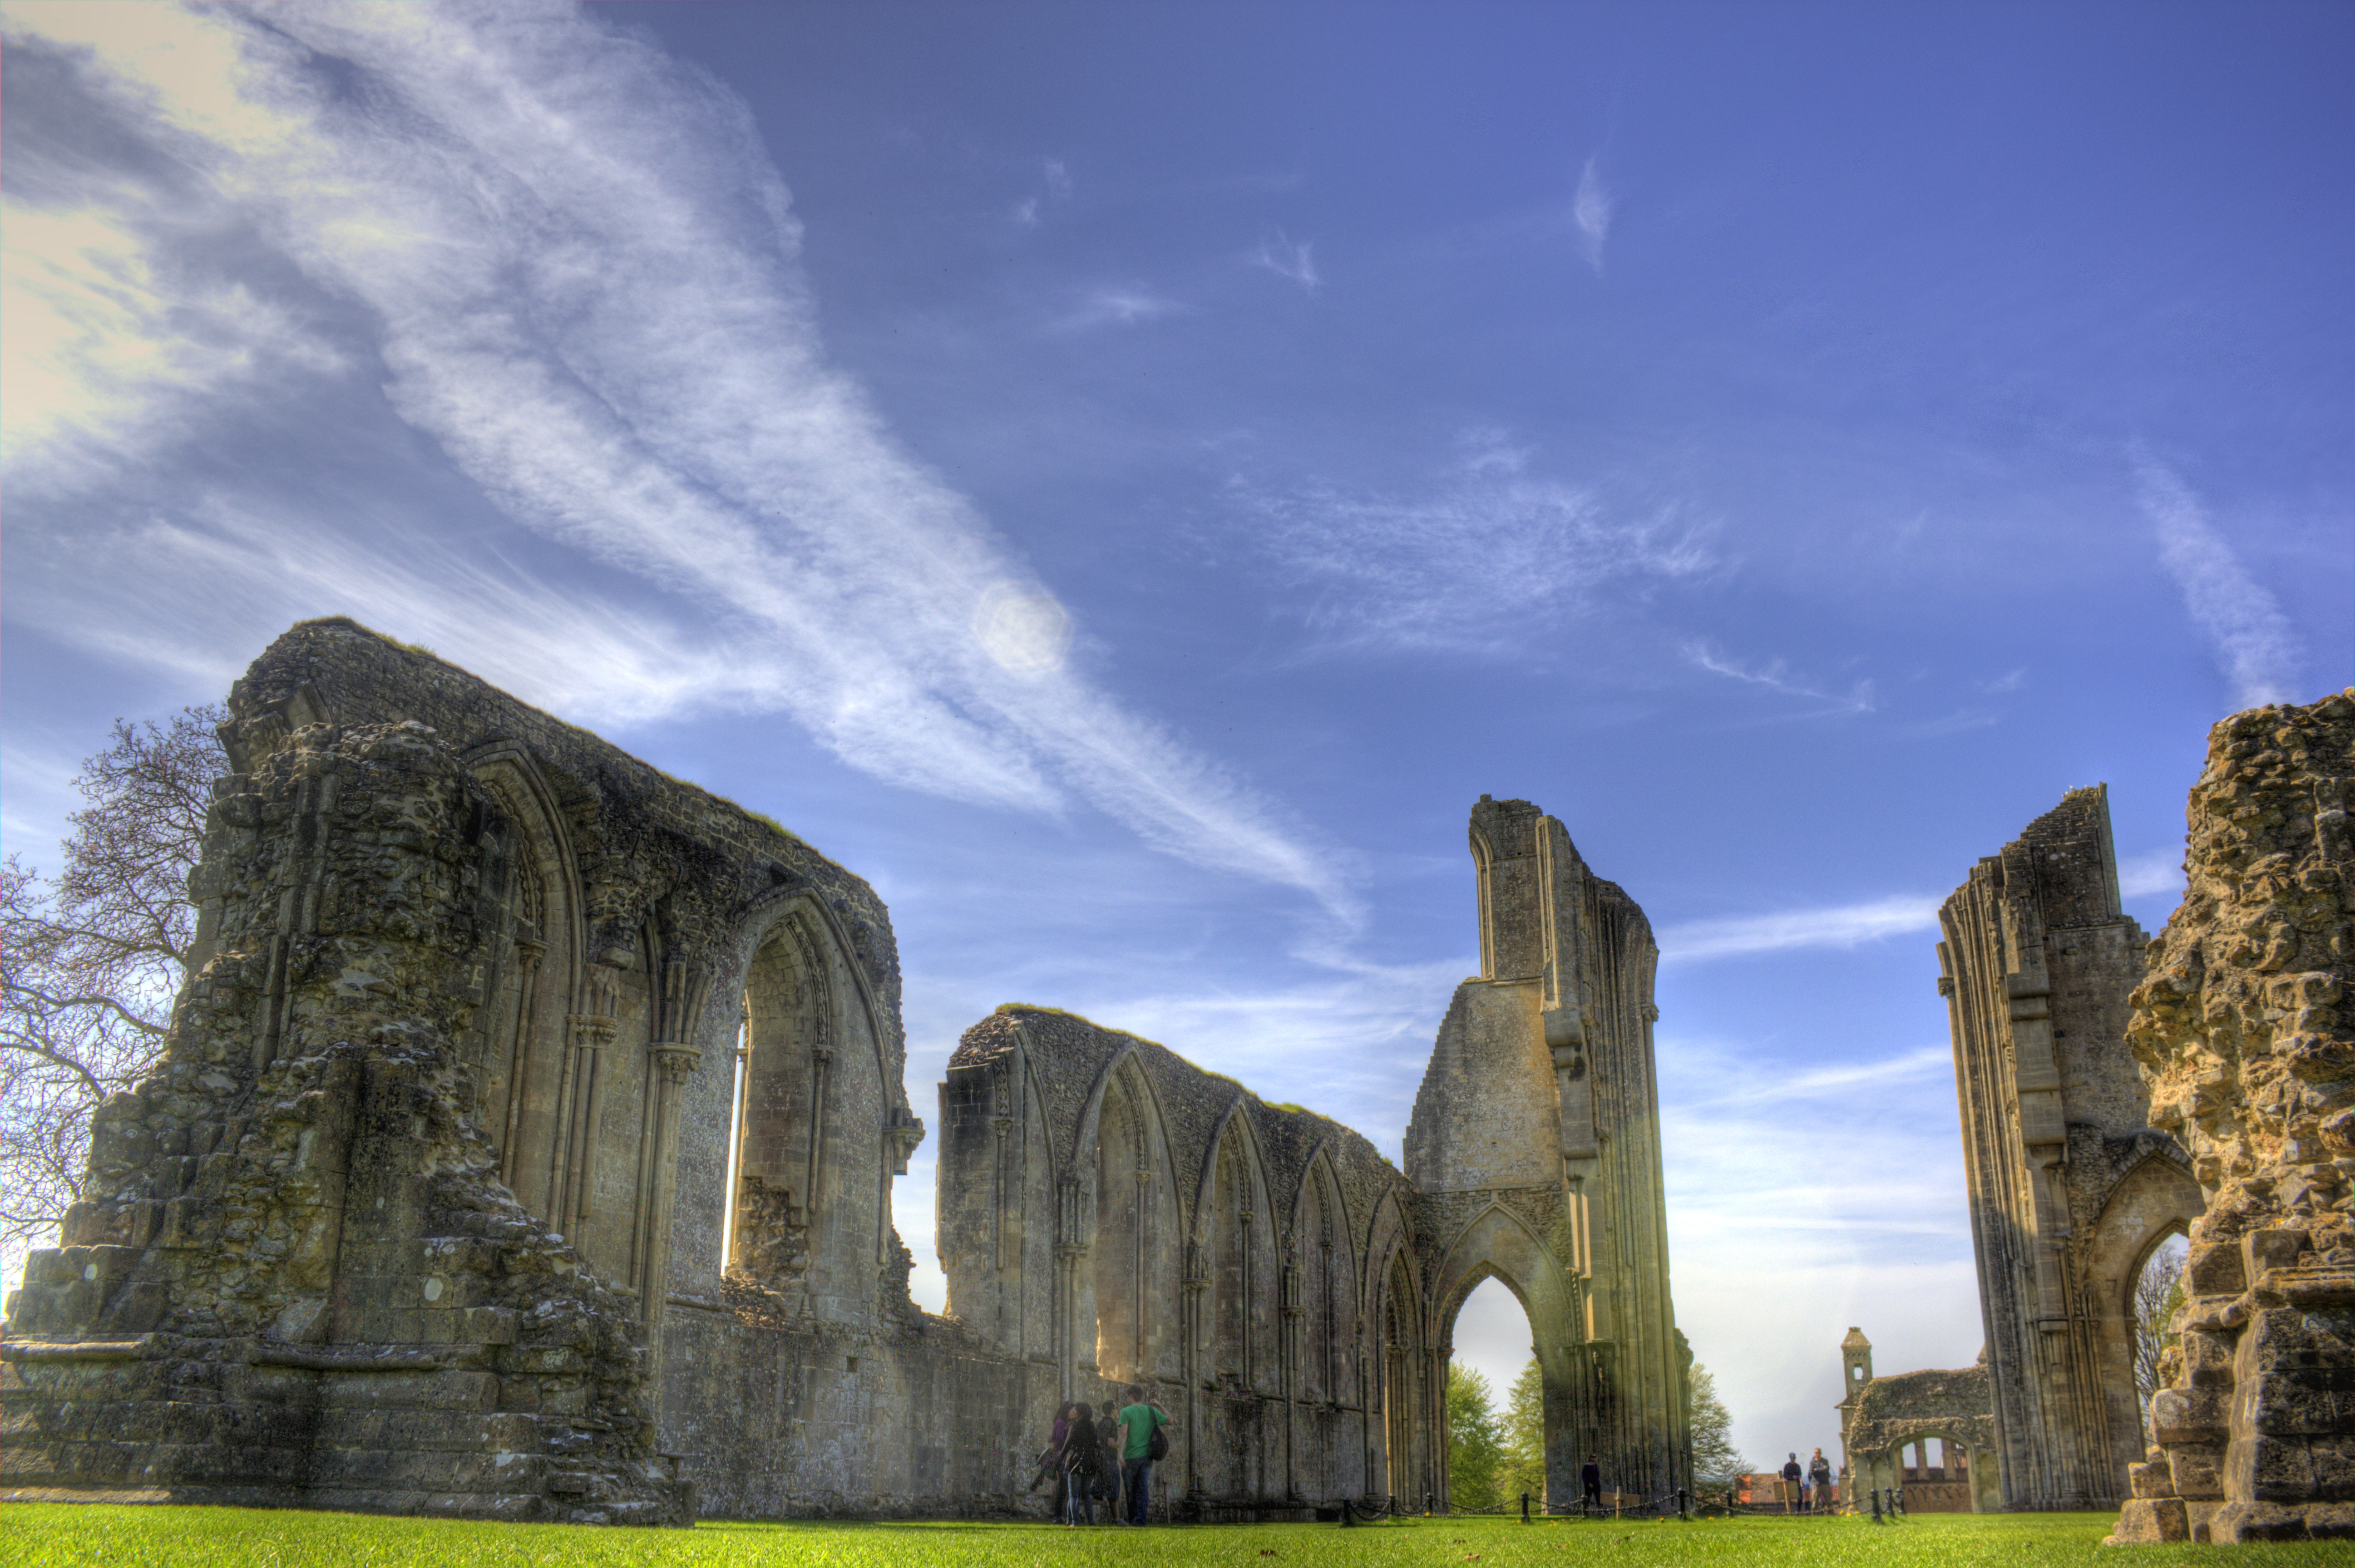 An image of Glastonbury Abbey.